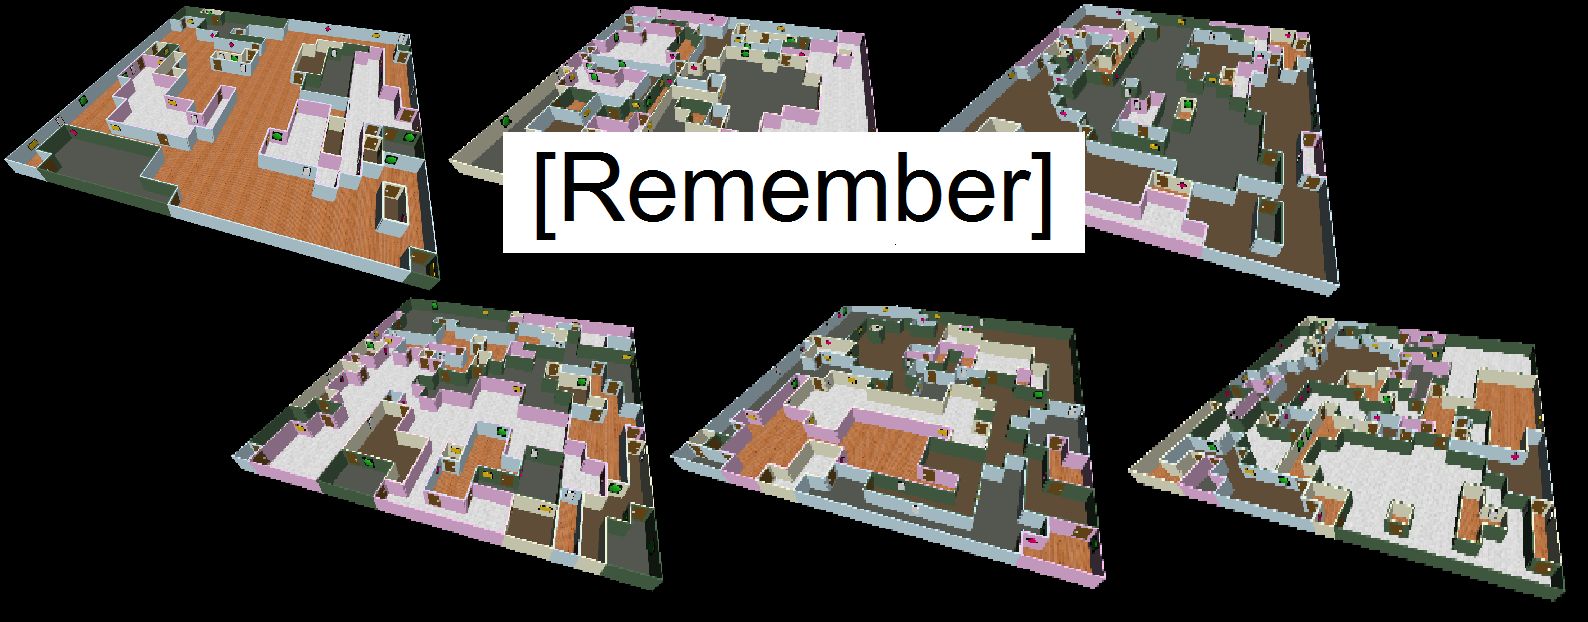 [Remember]